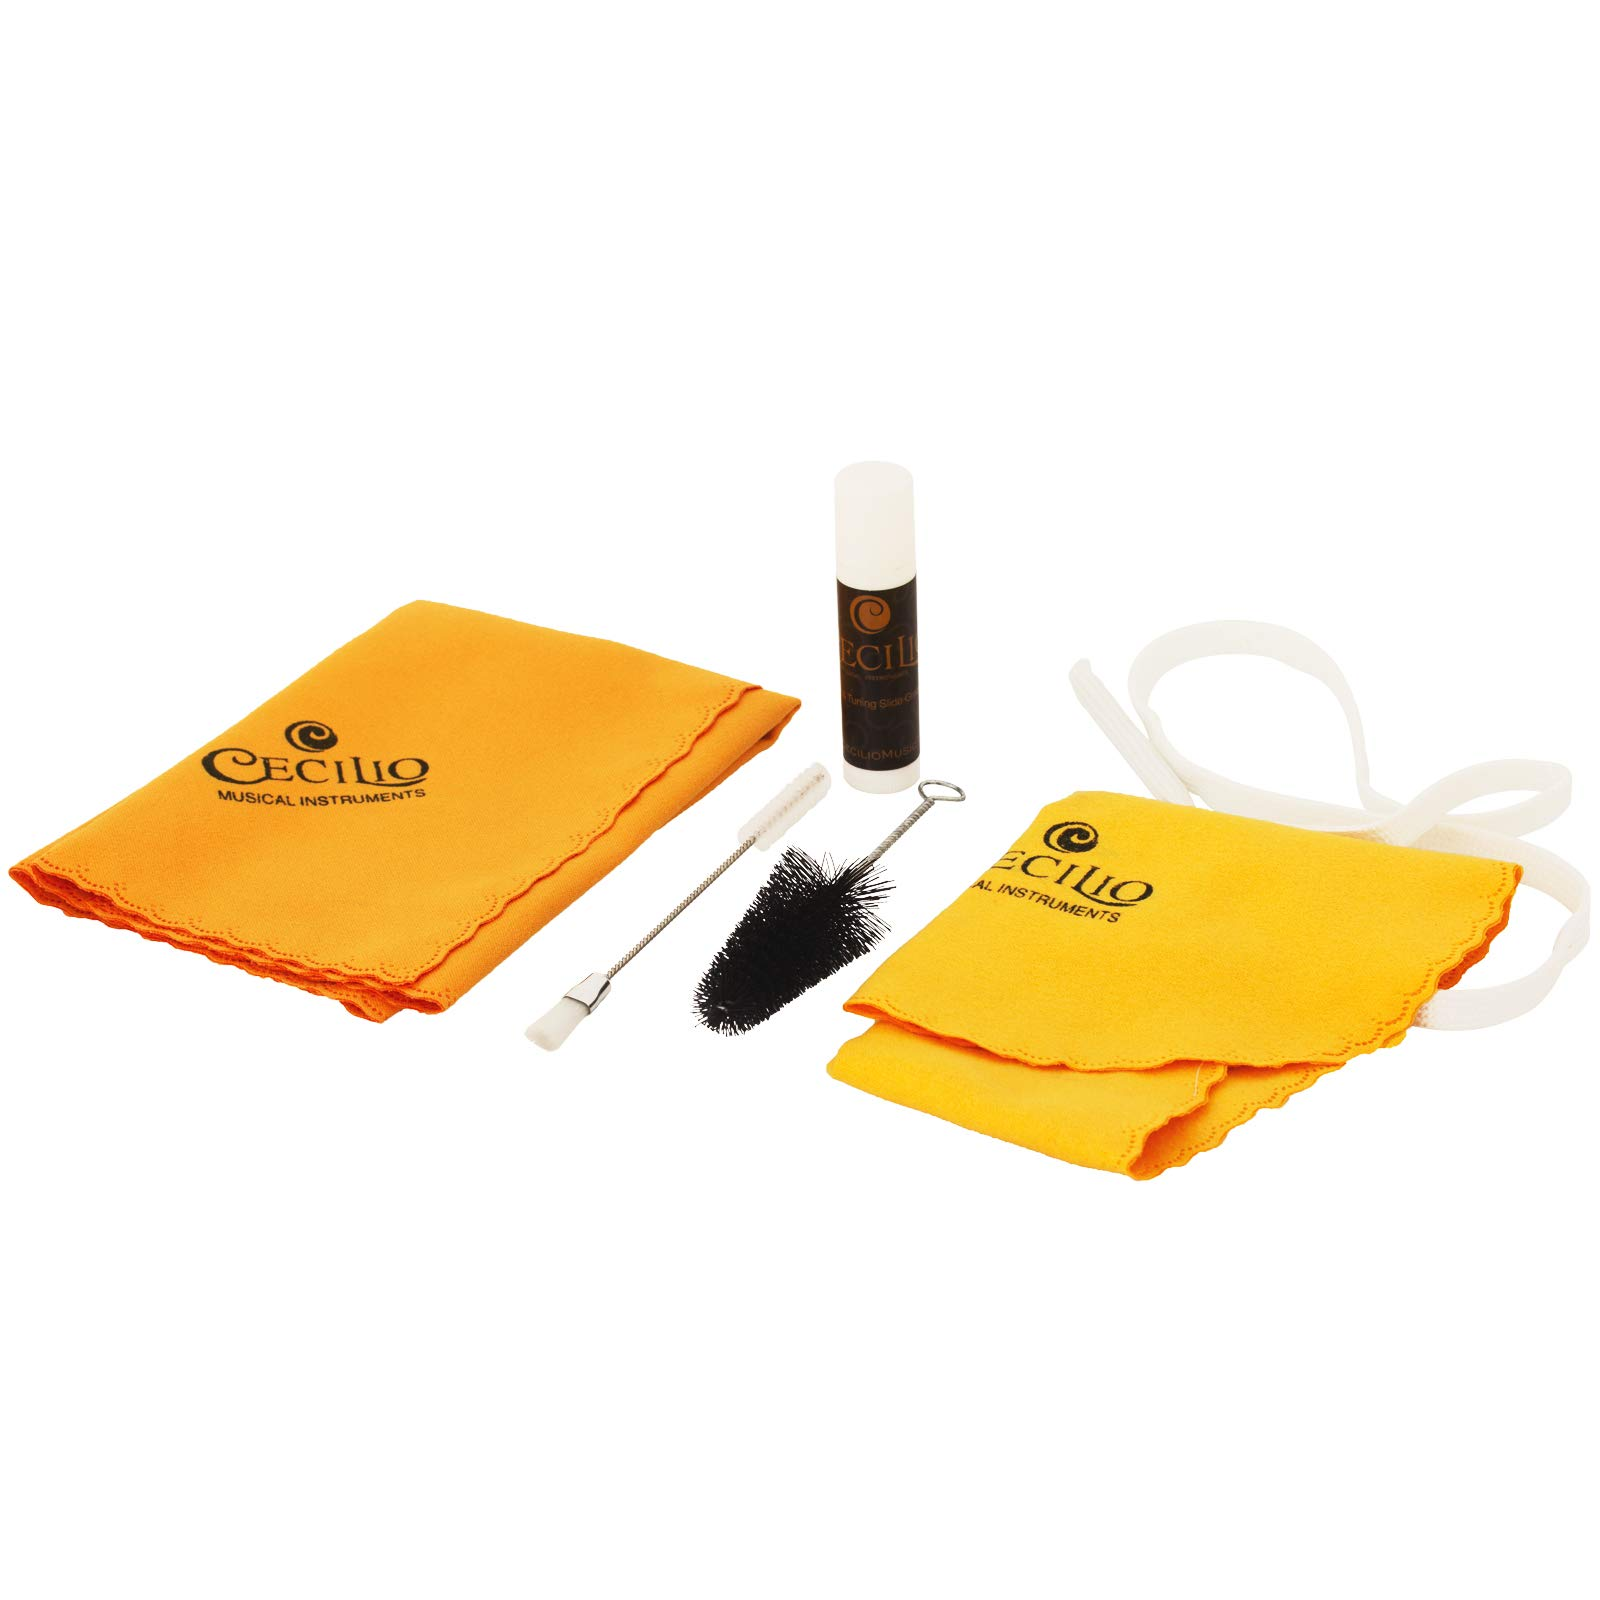 Cecilio Clarinet Care & Maintenance Kit